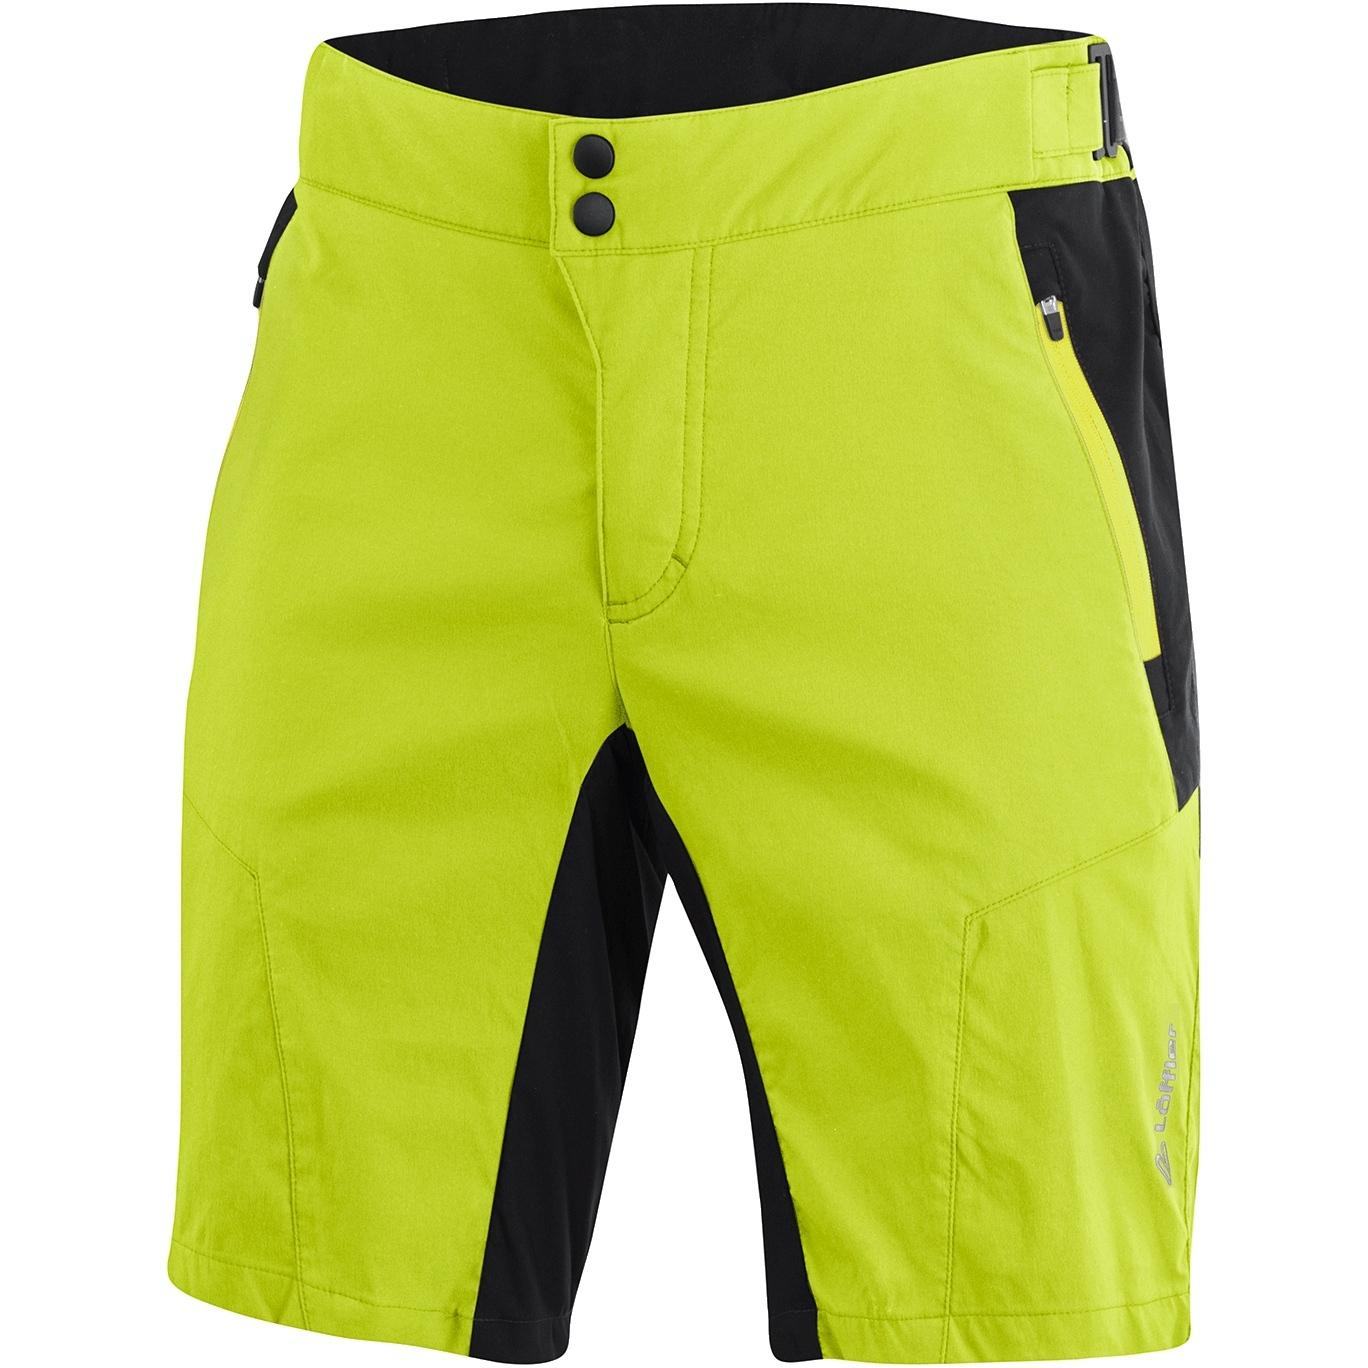 Löffler Bike Shorts Evo CSL 23504 - light green 330